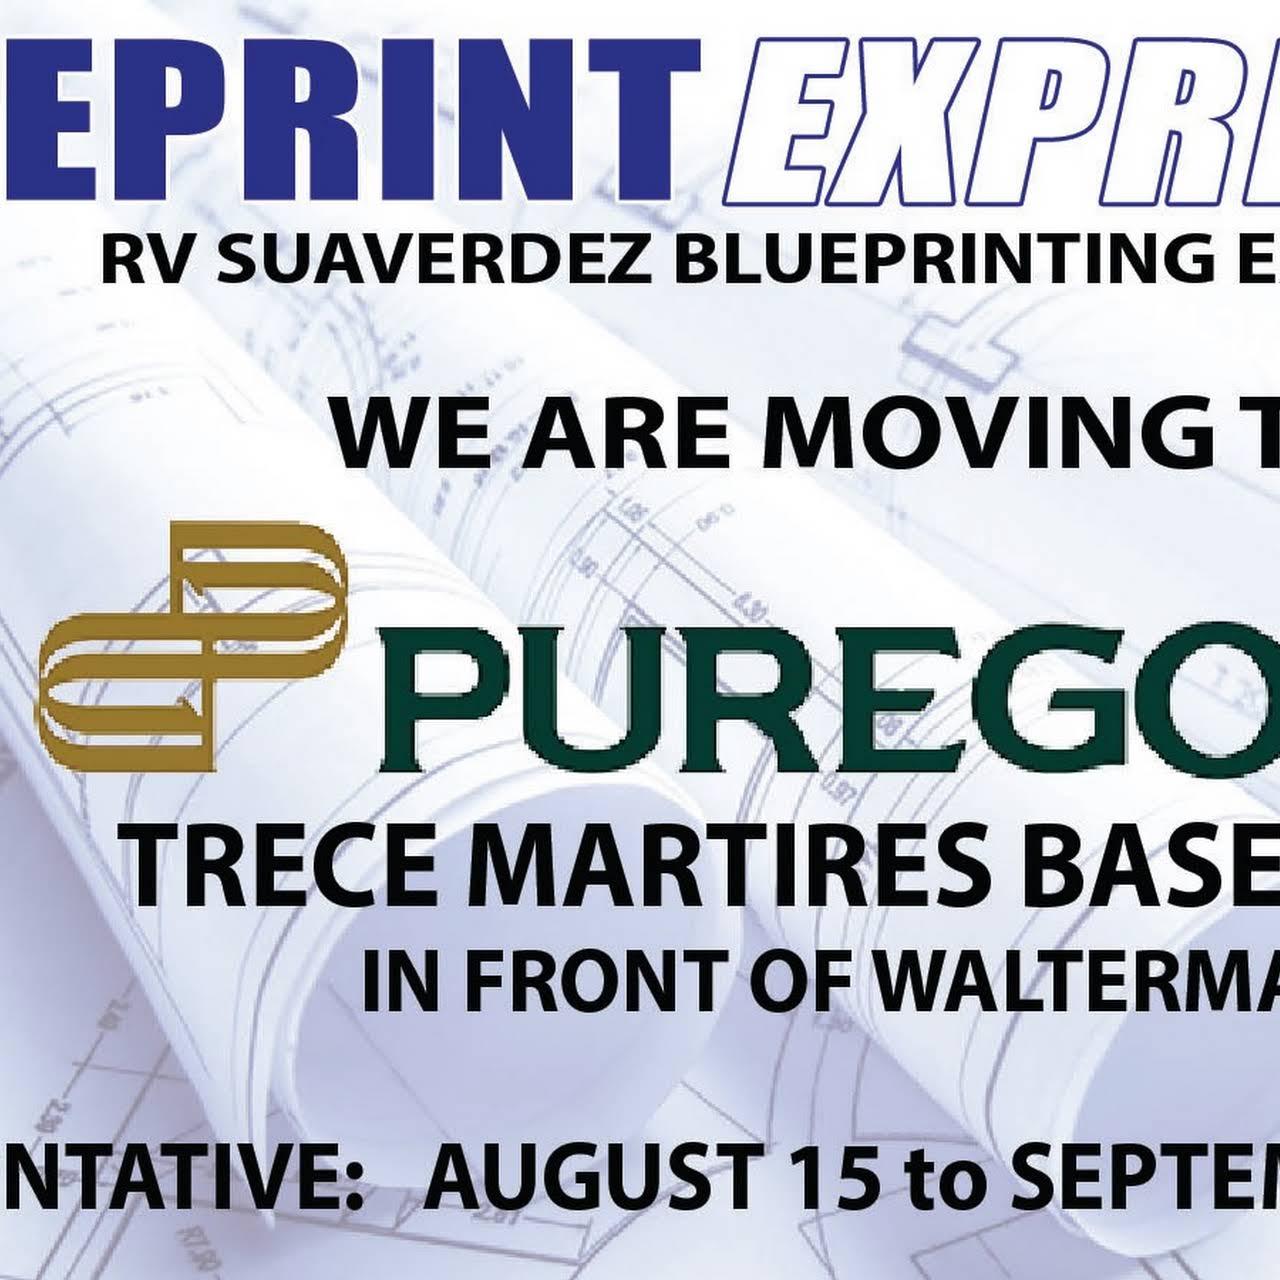 Blueprint express trece blueprint service in trece martires city updates malvernweather Choice Image